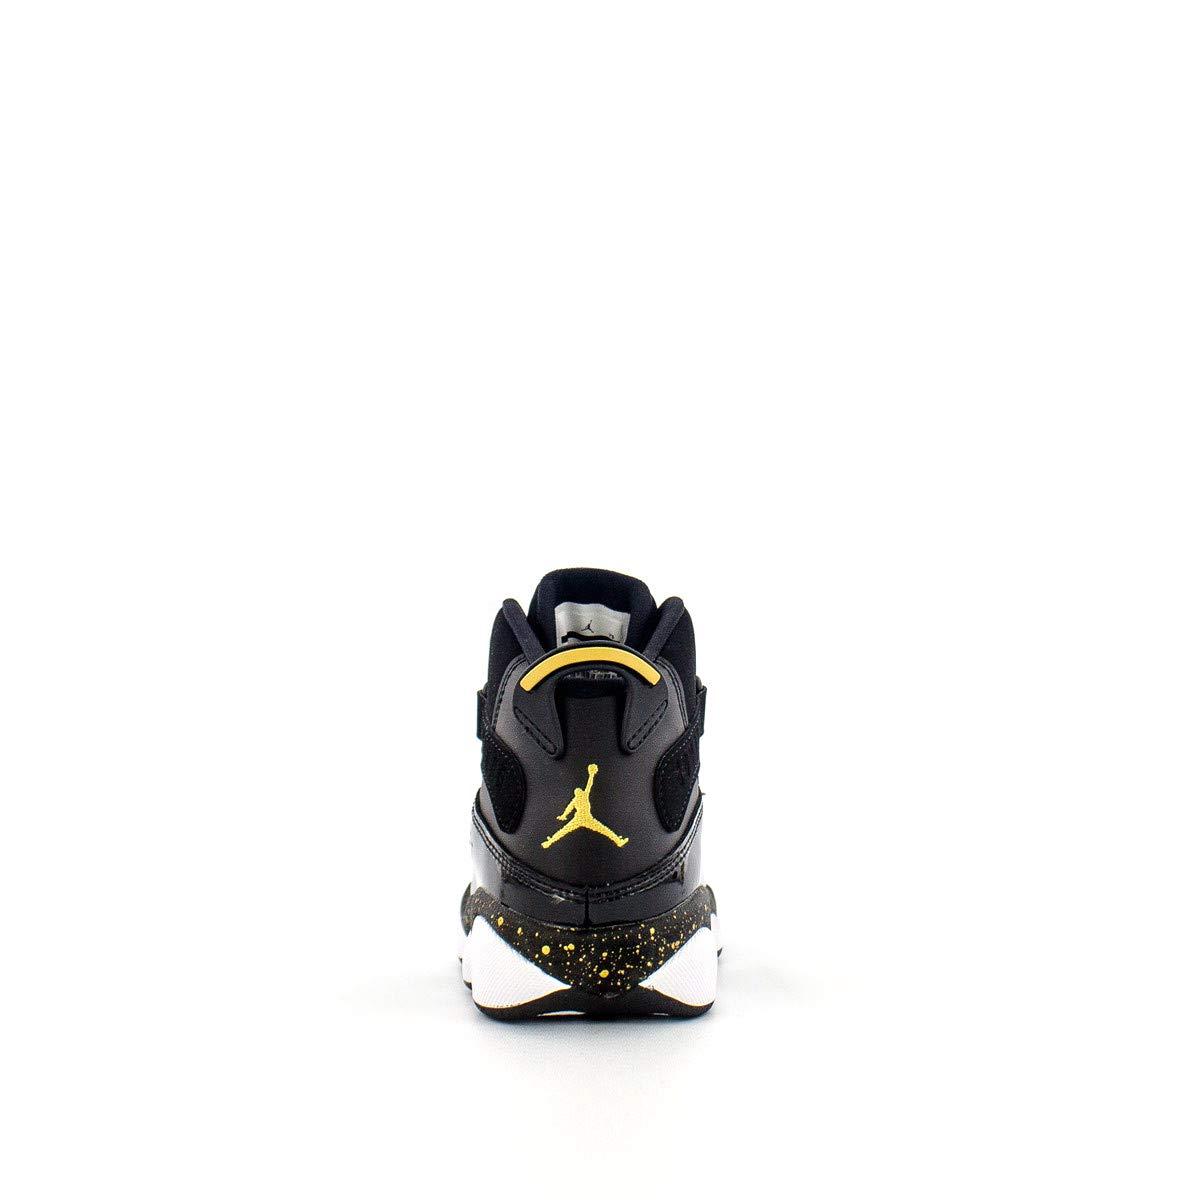 Jordan 6 Rings Black//Metallic Gold-White PS 1.5 M US Little Kid